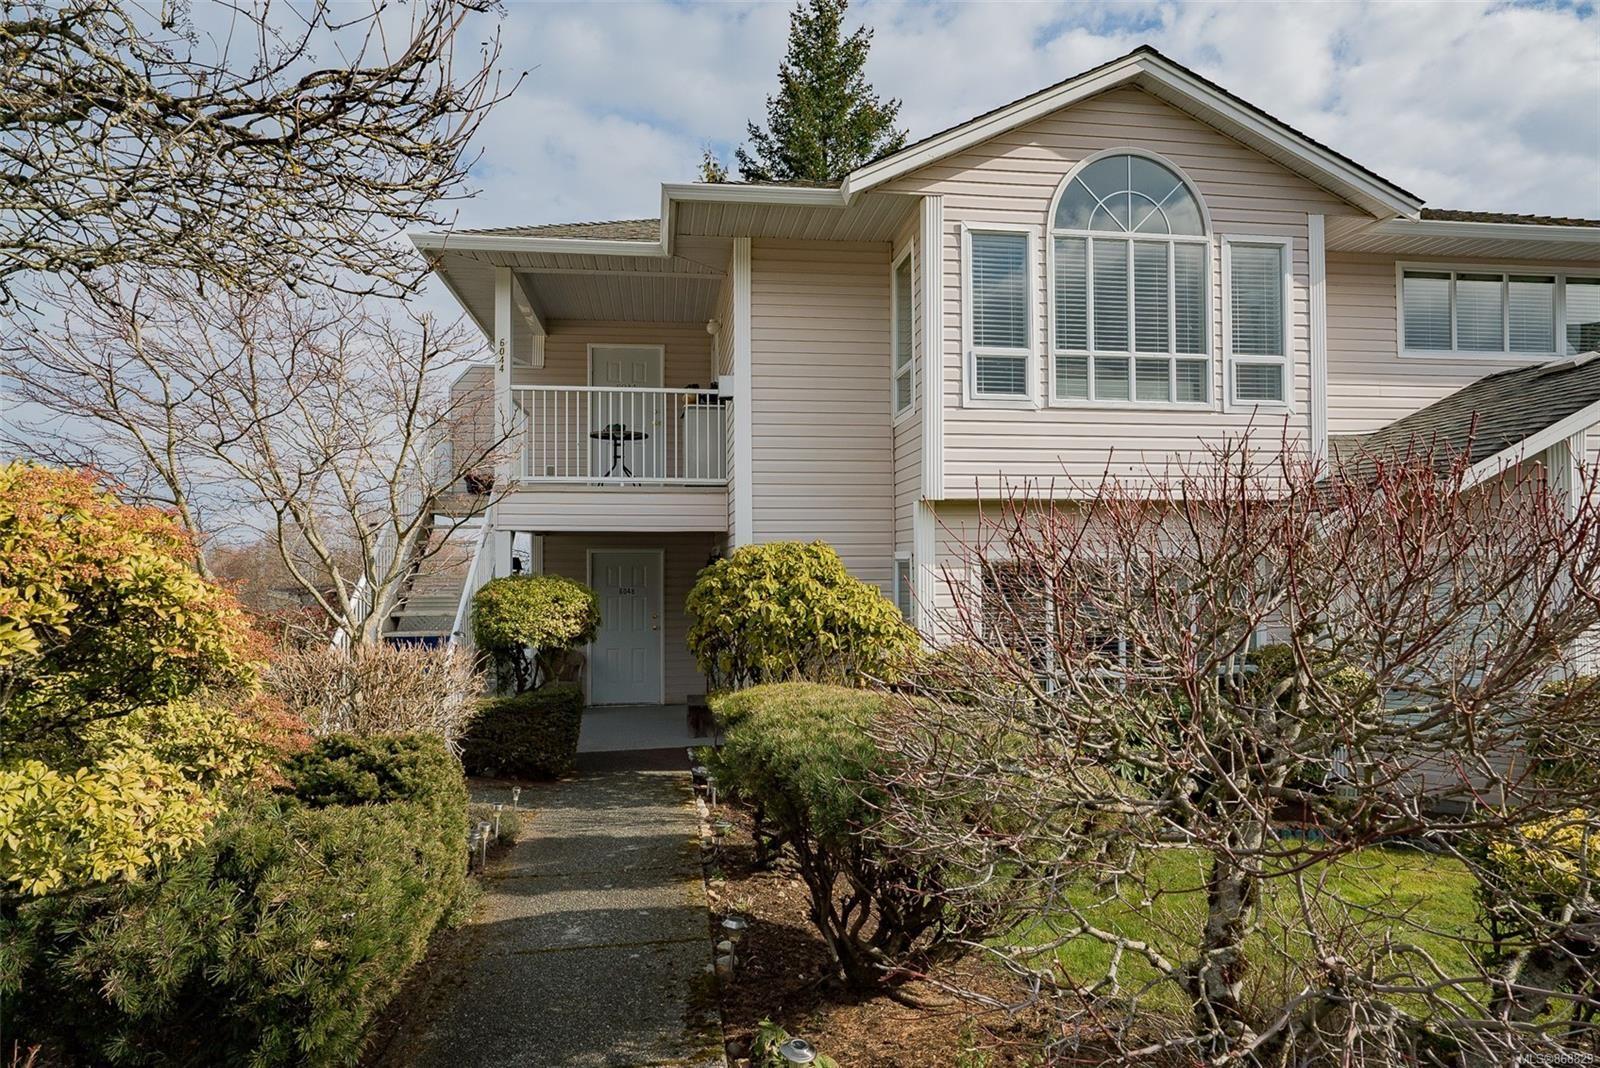 Main Photo: 6048 N Cedar Grove Dr in : Na North Nanaimo Row/Townhouse for sale (Nanaimo)  : MLS®# 868829